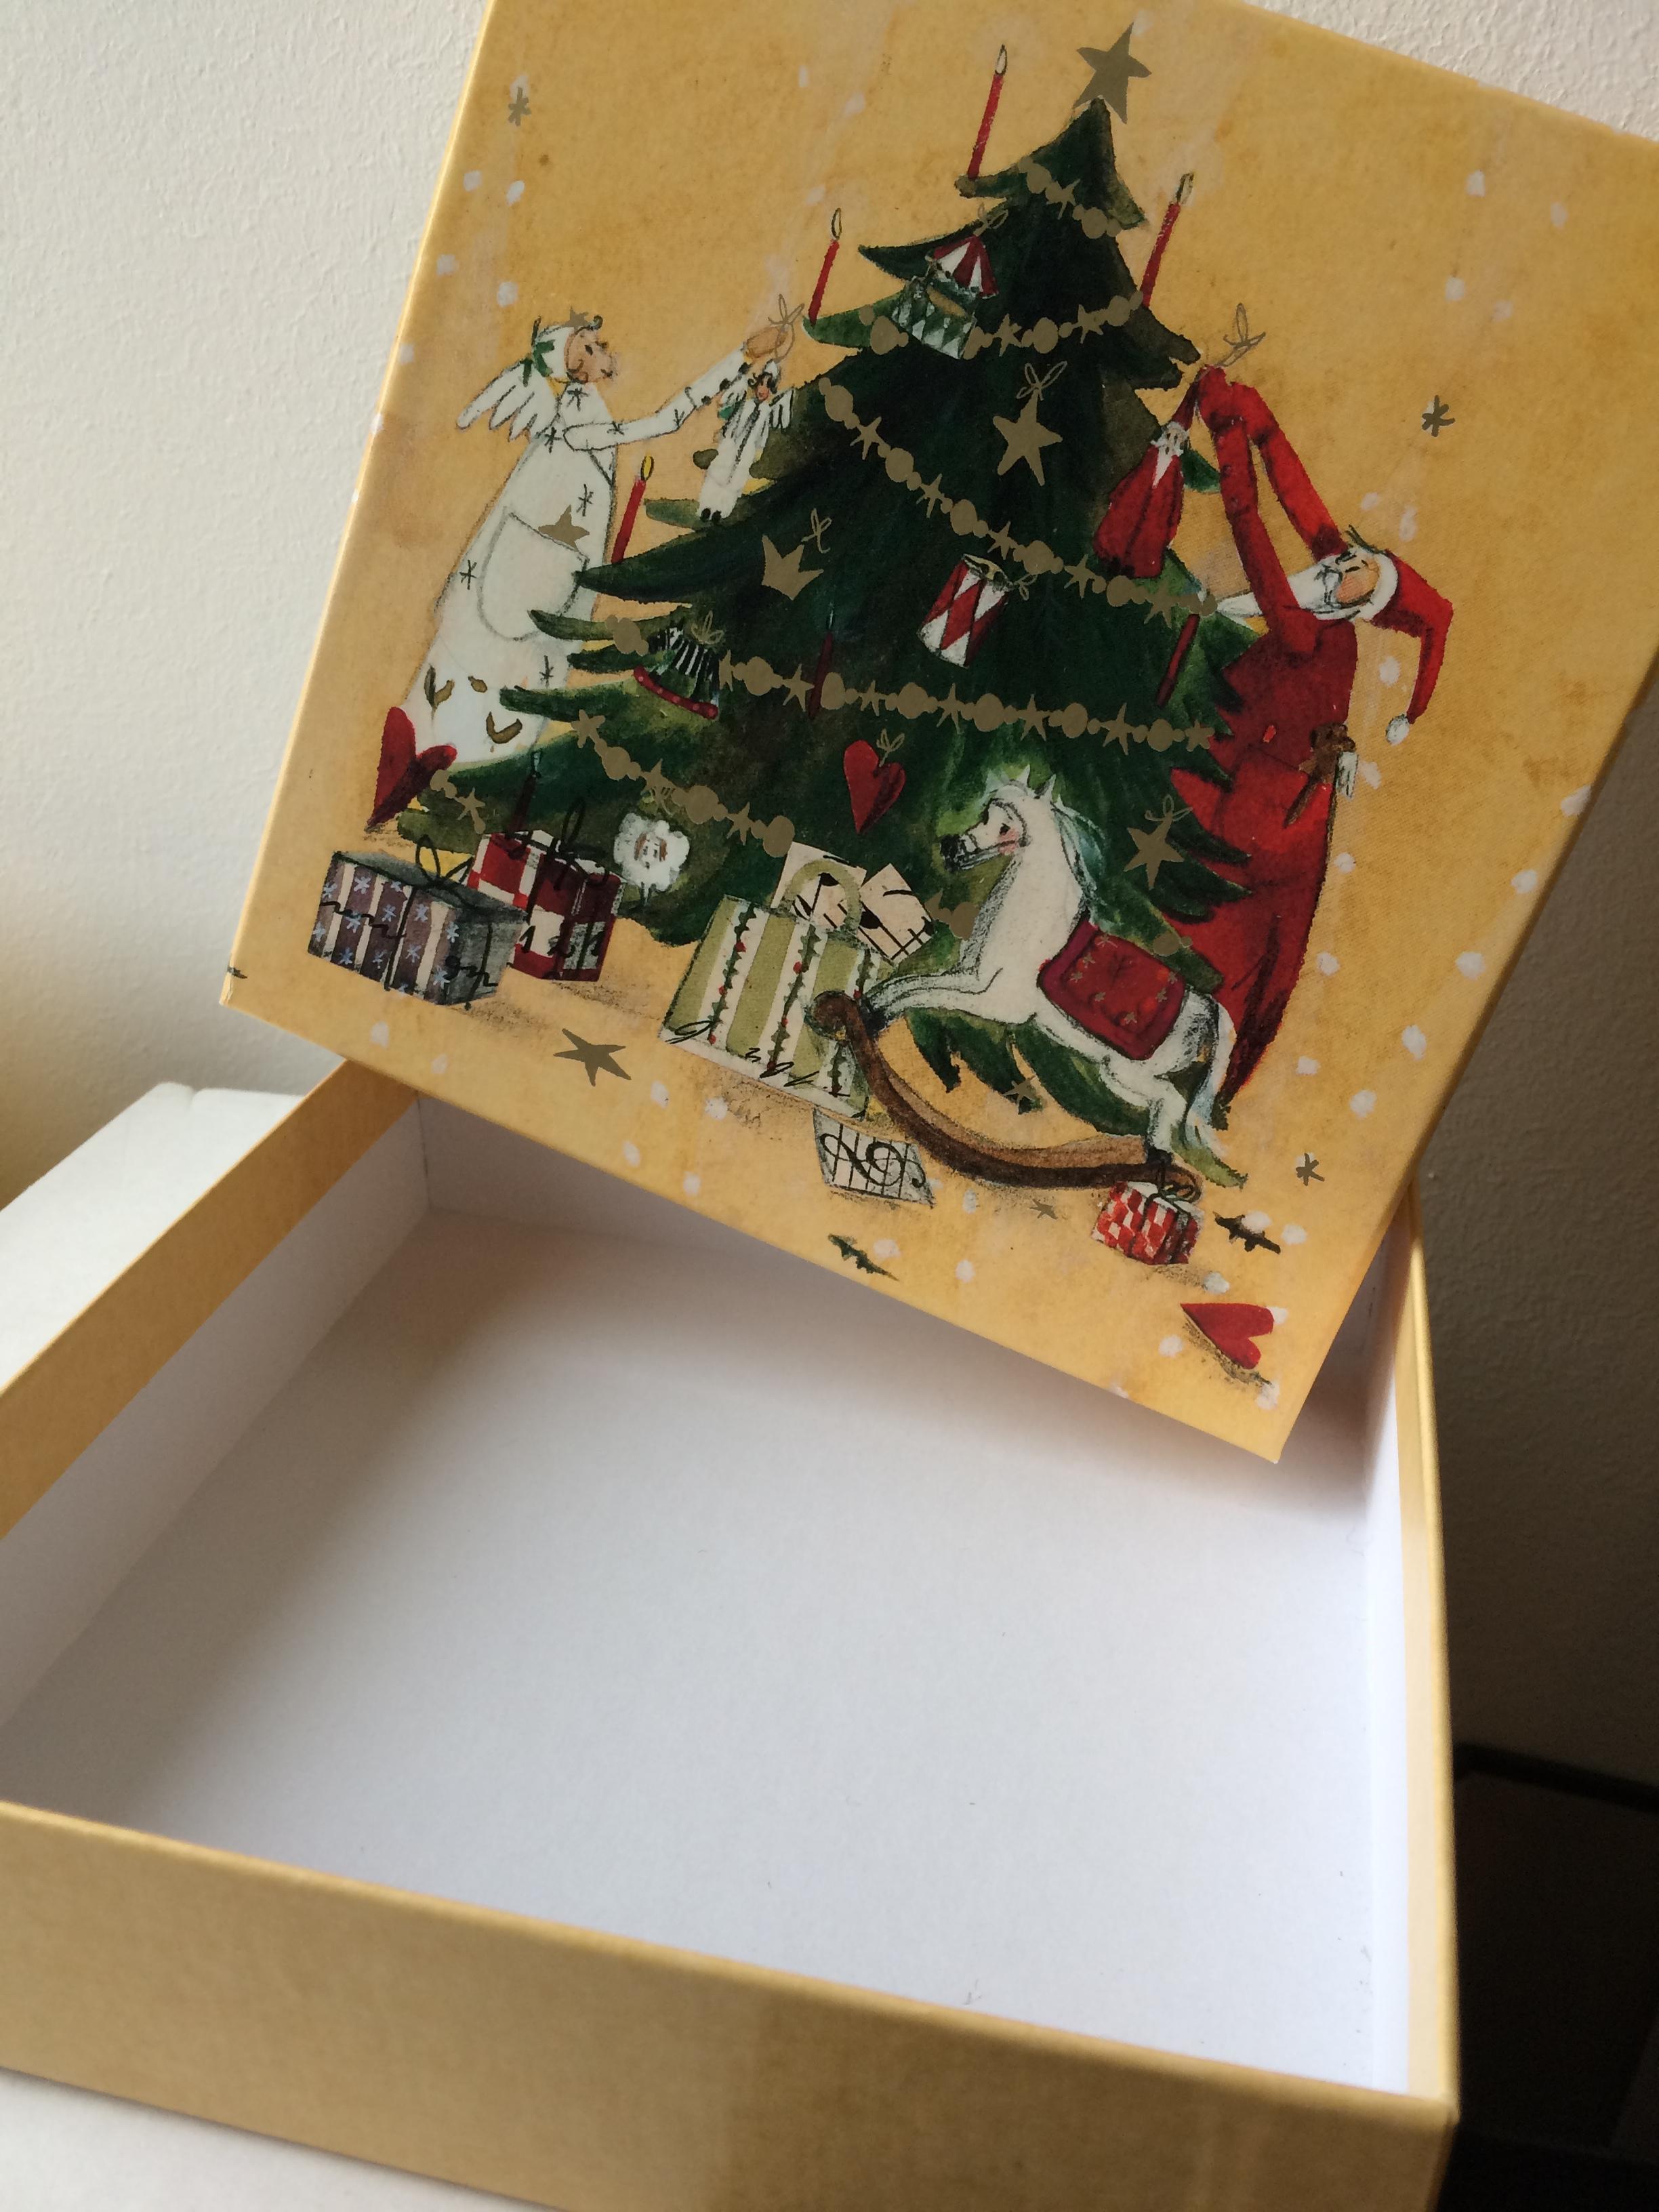 geschenk schachtel weihnachten silke leffler d37217. Black Bedroom Furniture Sets. Home Design Ideas